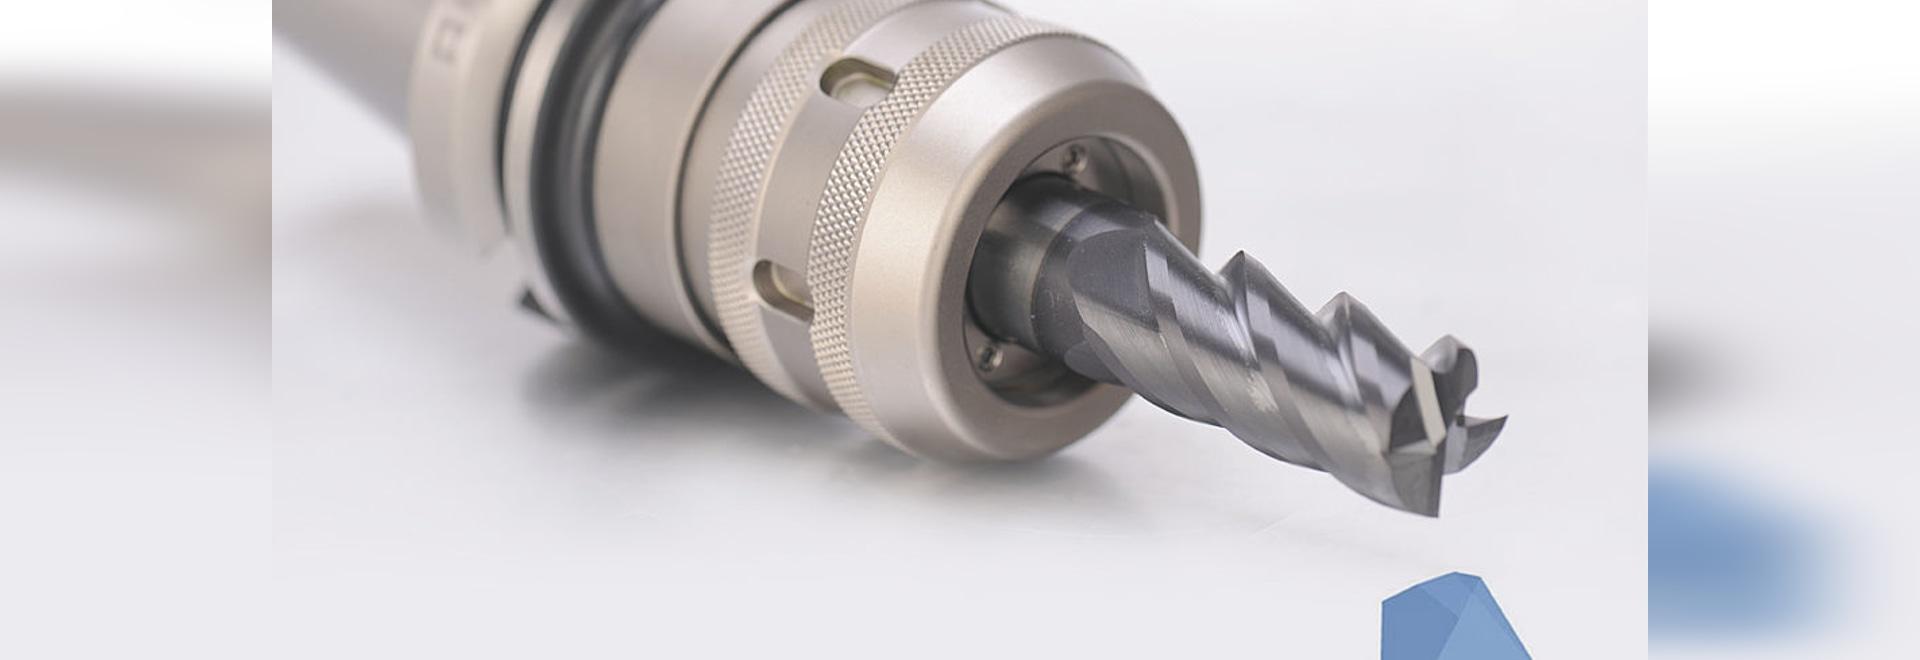 Power chuck / with straight collet ø 20-42 mm | BT30, BT40, BT50 | BT-MLC Series